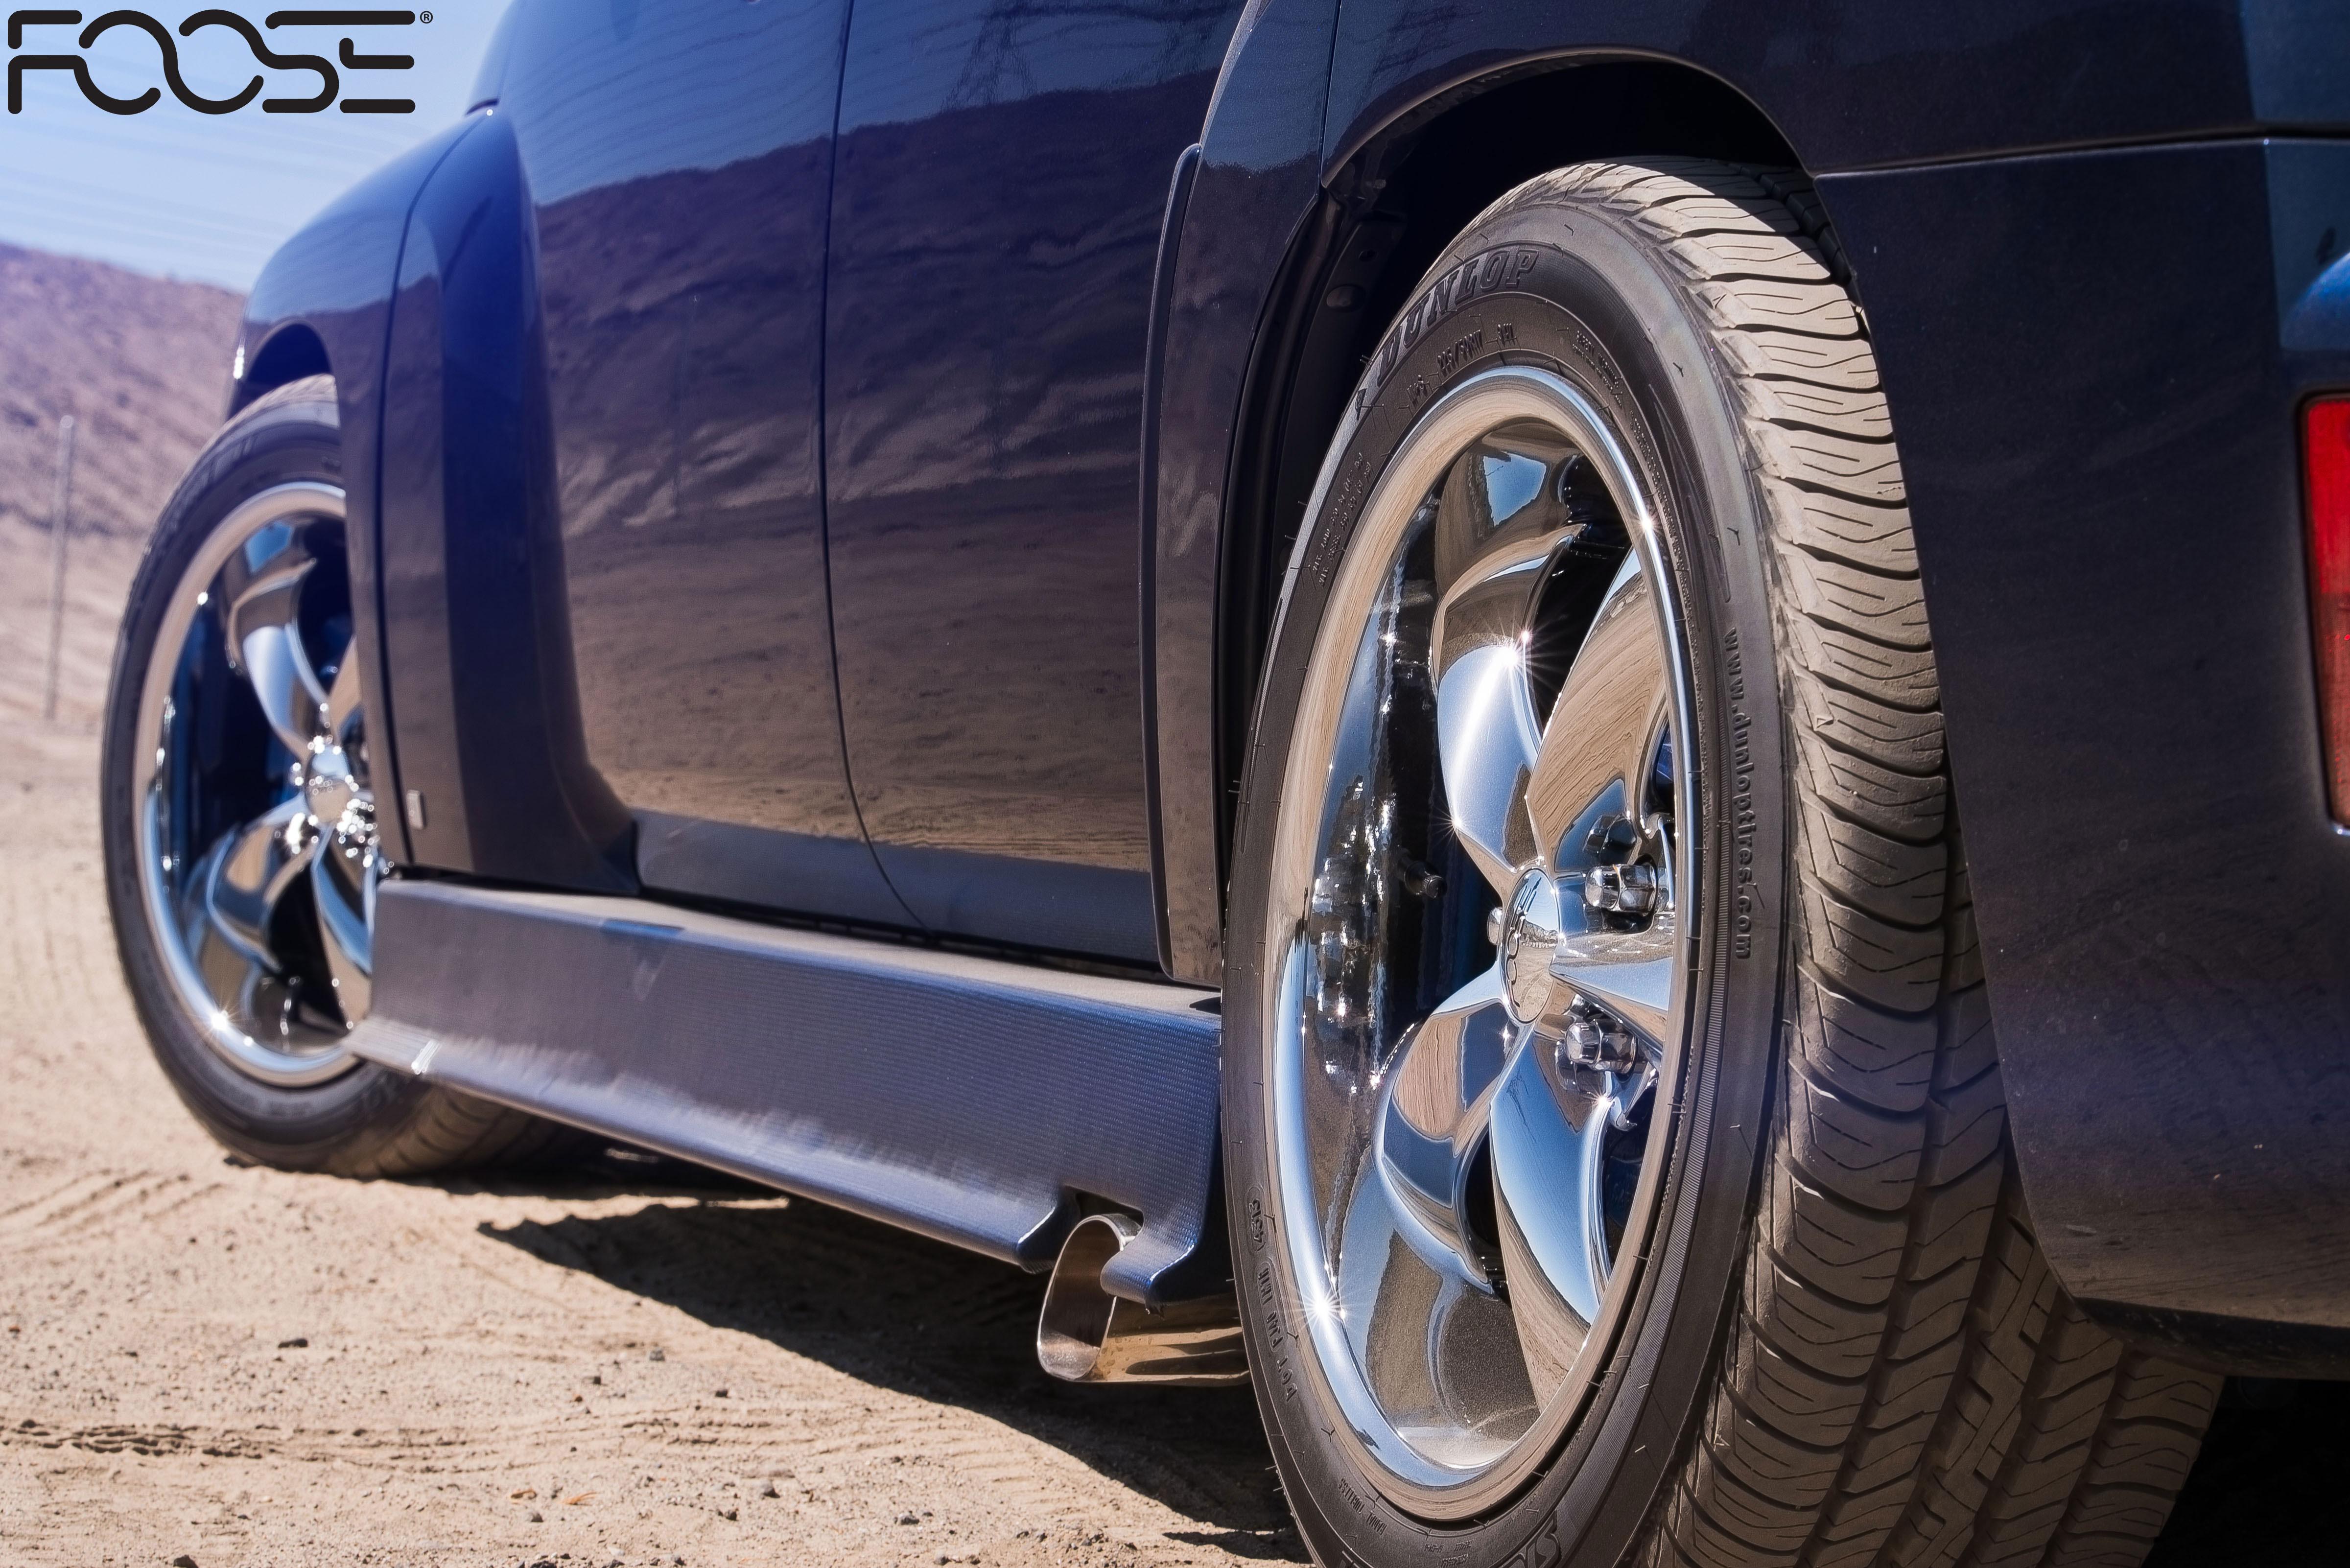 Chevrolet HHR Legend (PVD) - F103 Gallery - MHT Wheels Inc.